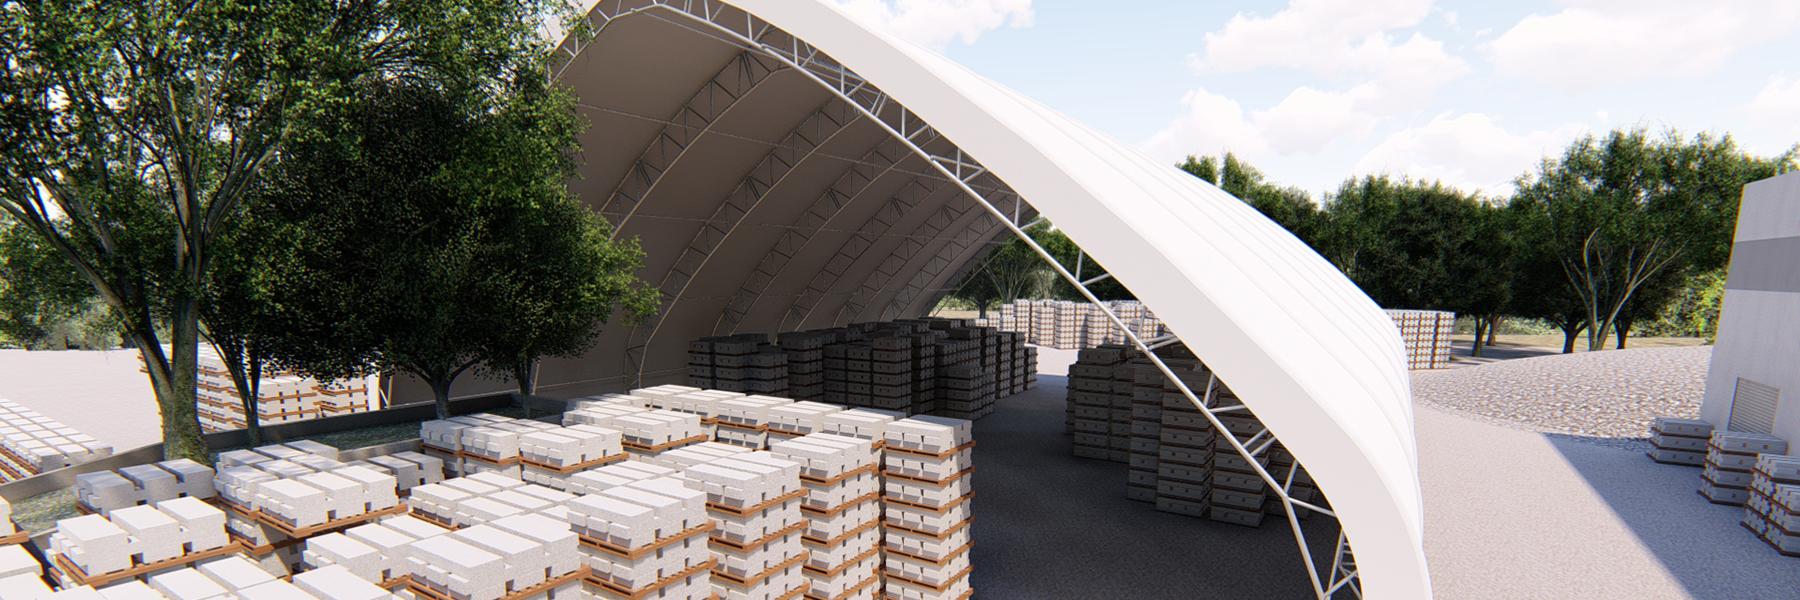 Warehouse Storage Building 3D Rendering